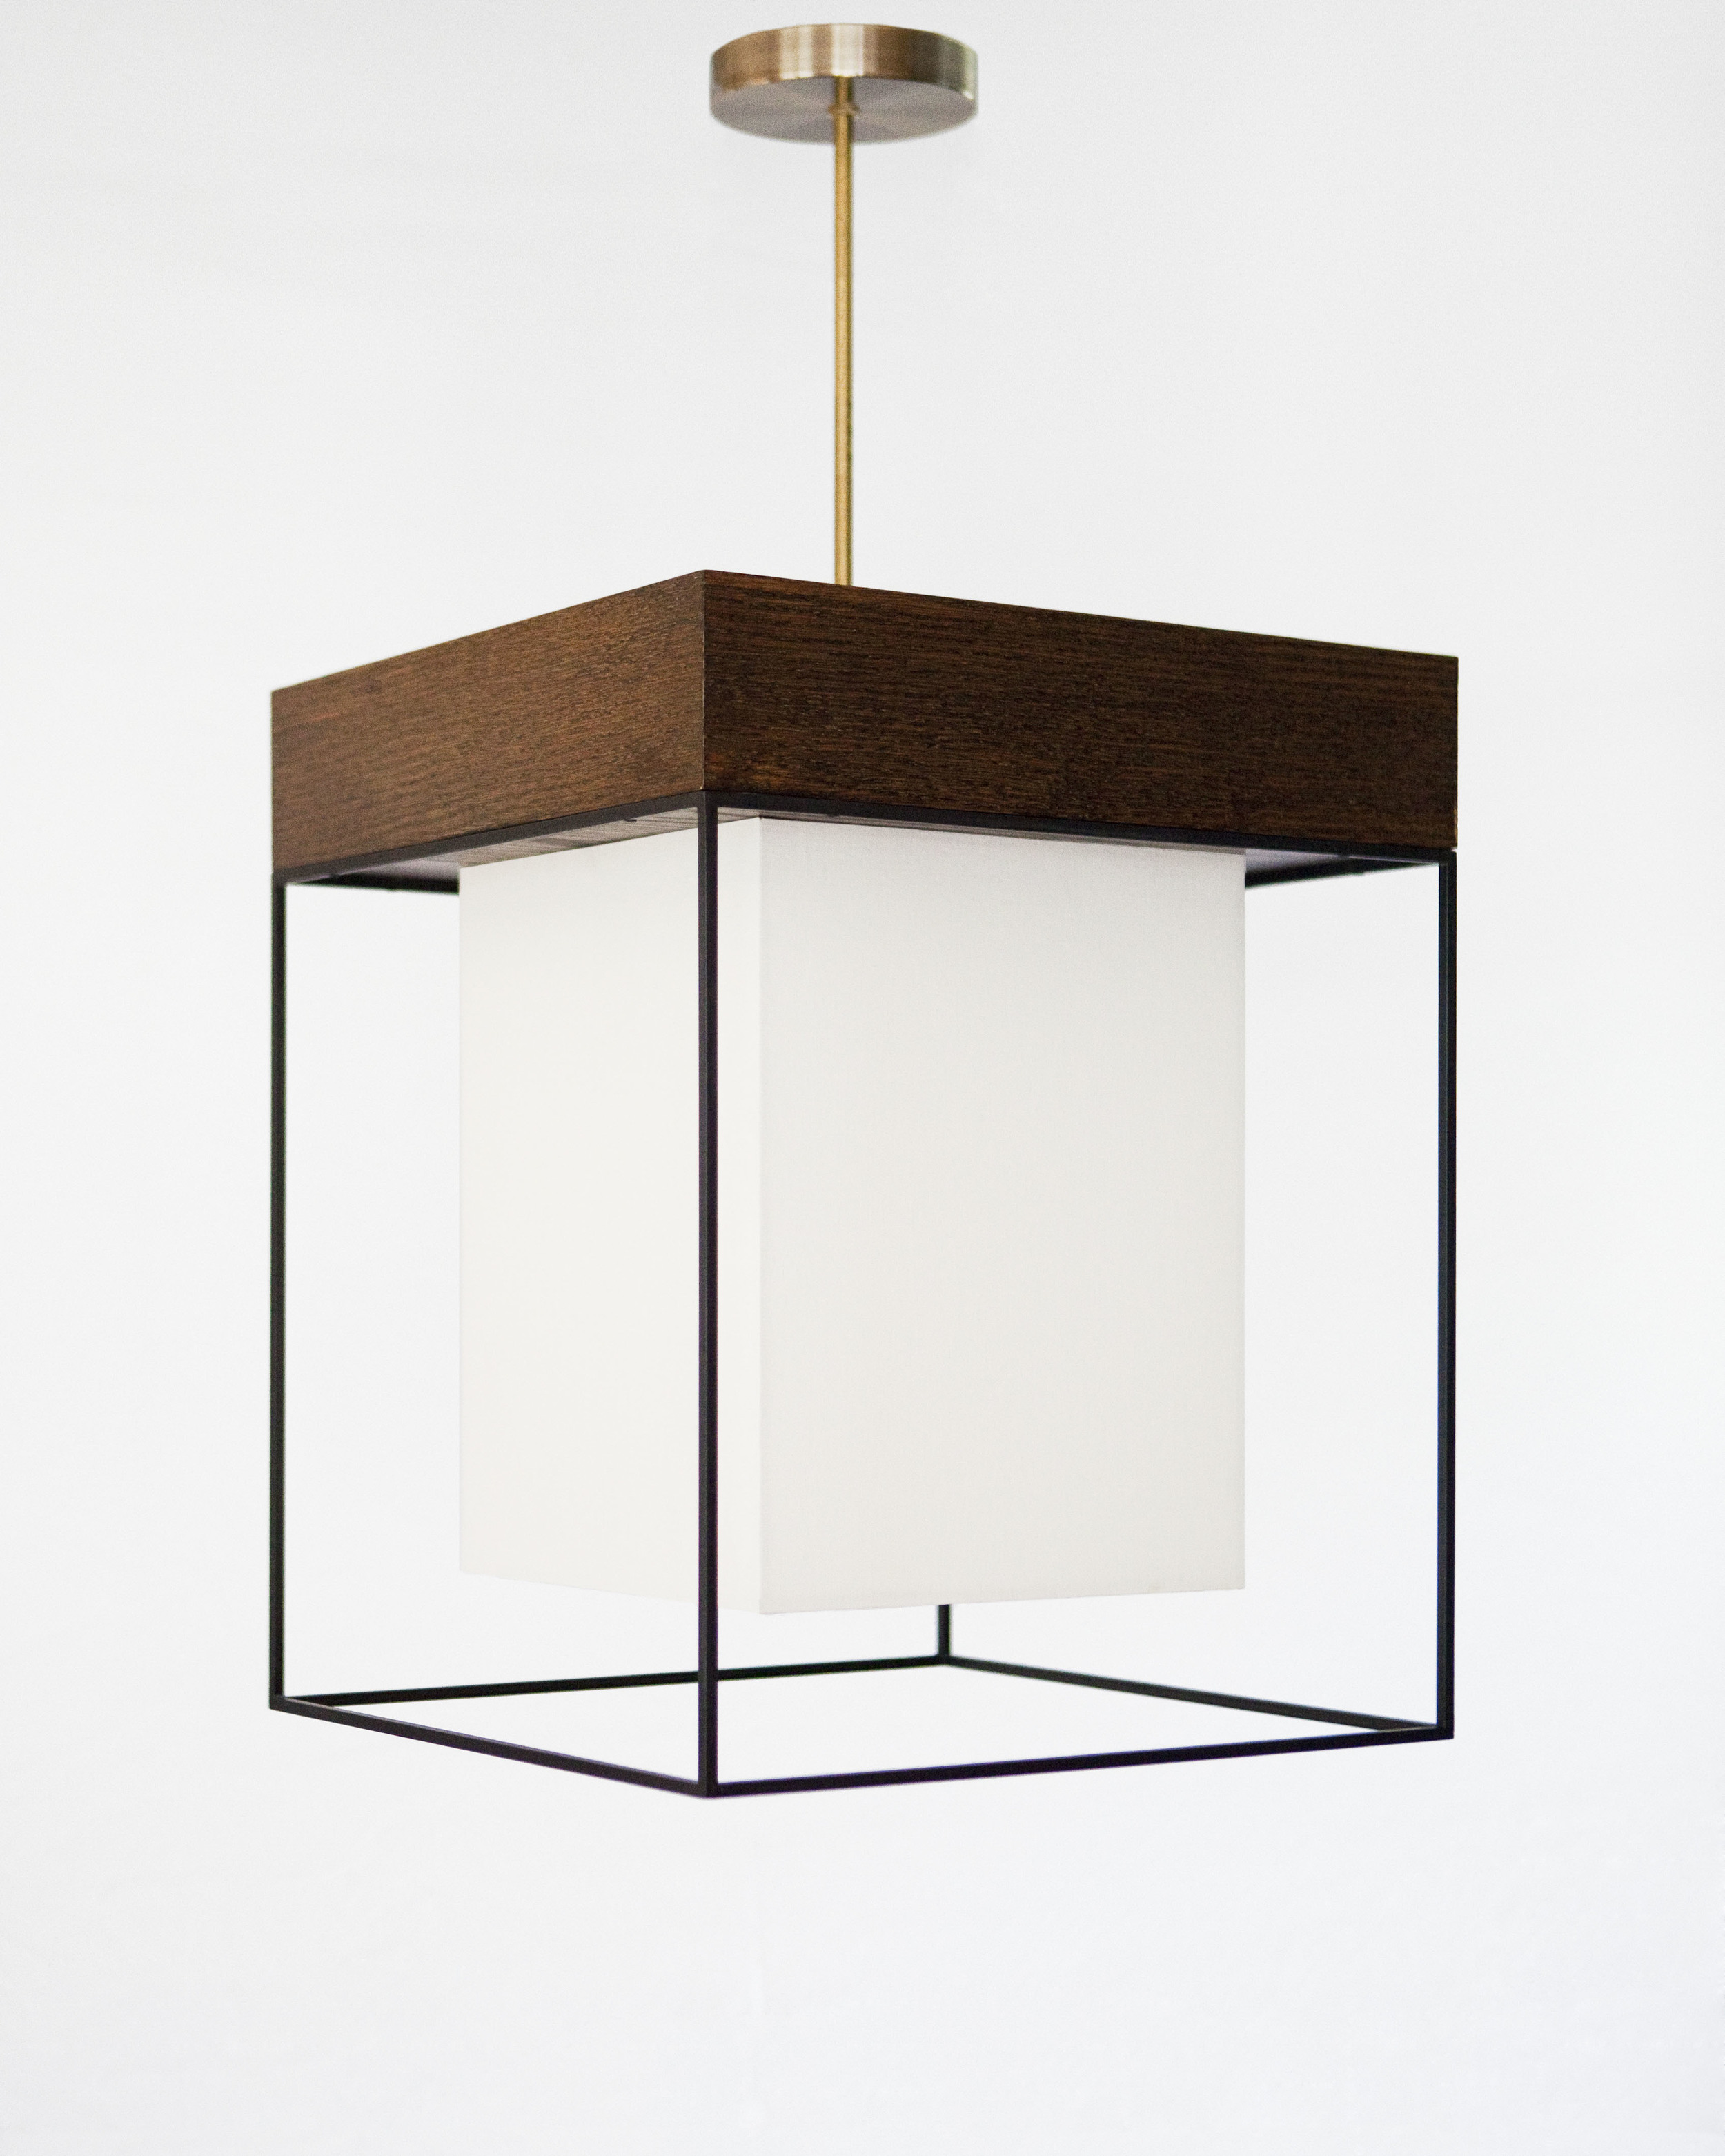 lamp-angle.jpg